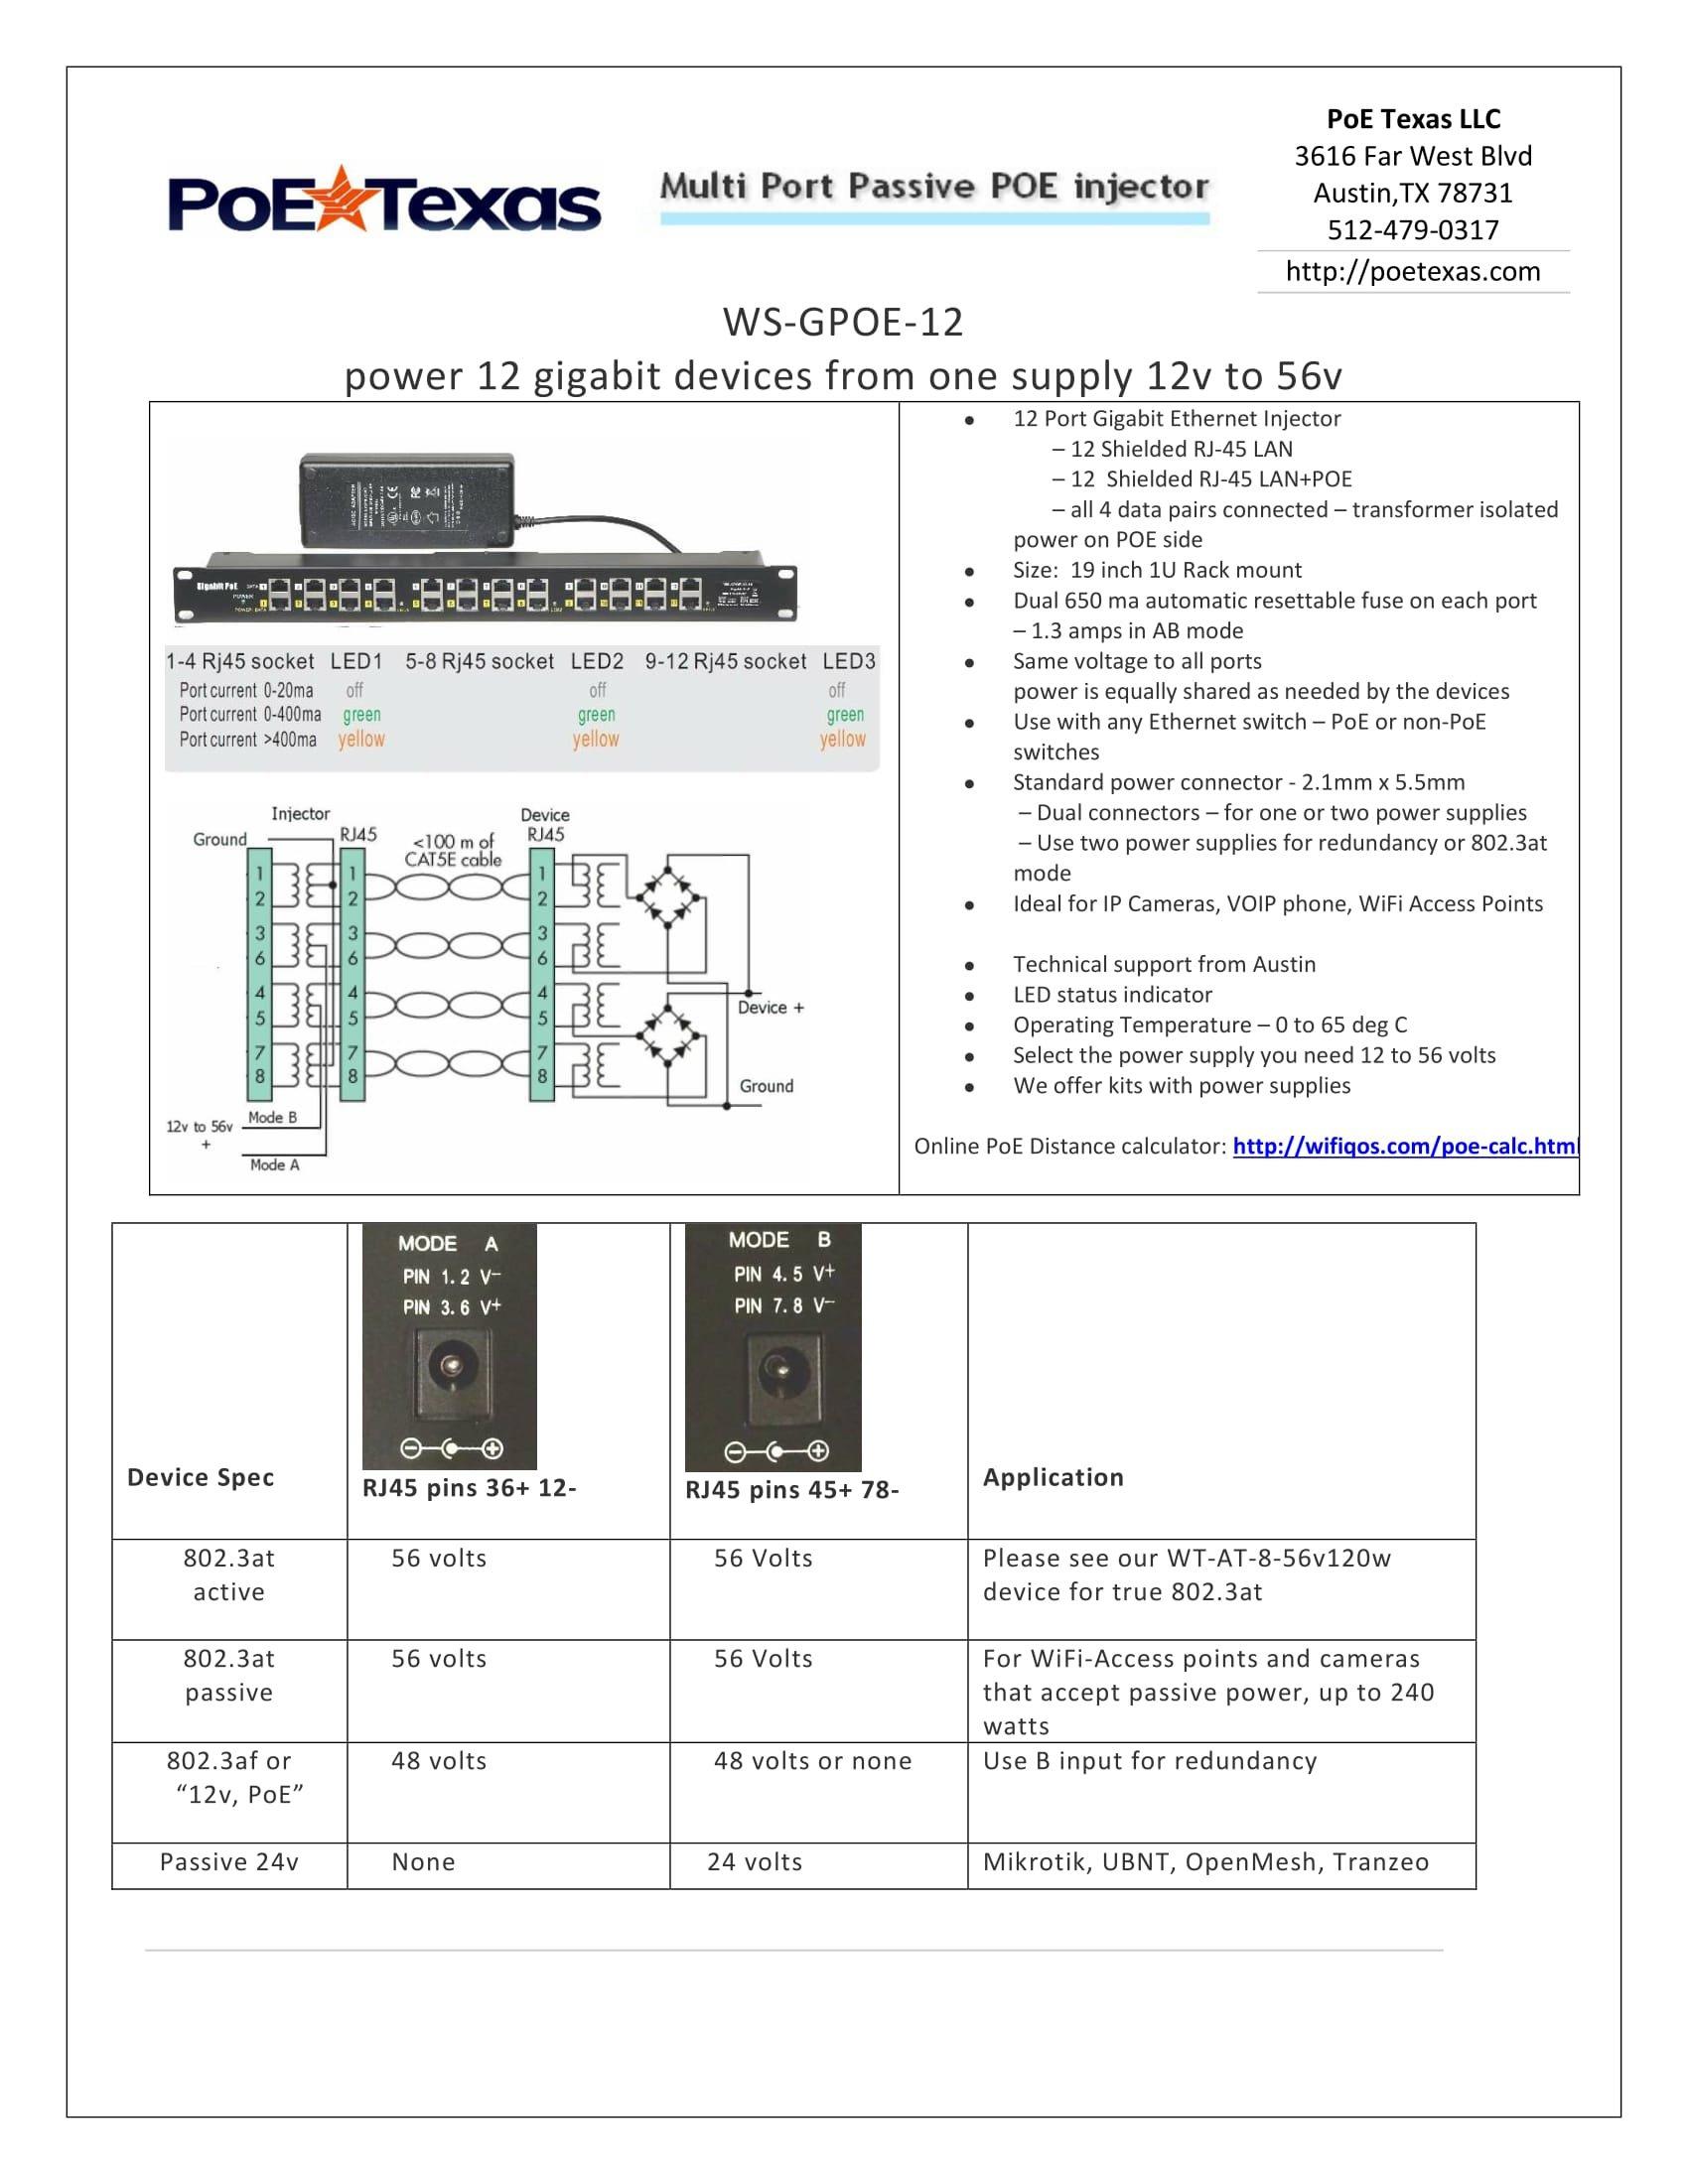 WS-GPOE-12-48v120w gigabit 12 Port Power over Ethernet Injector passive POE for 802.3af devices